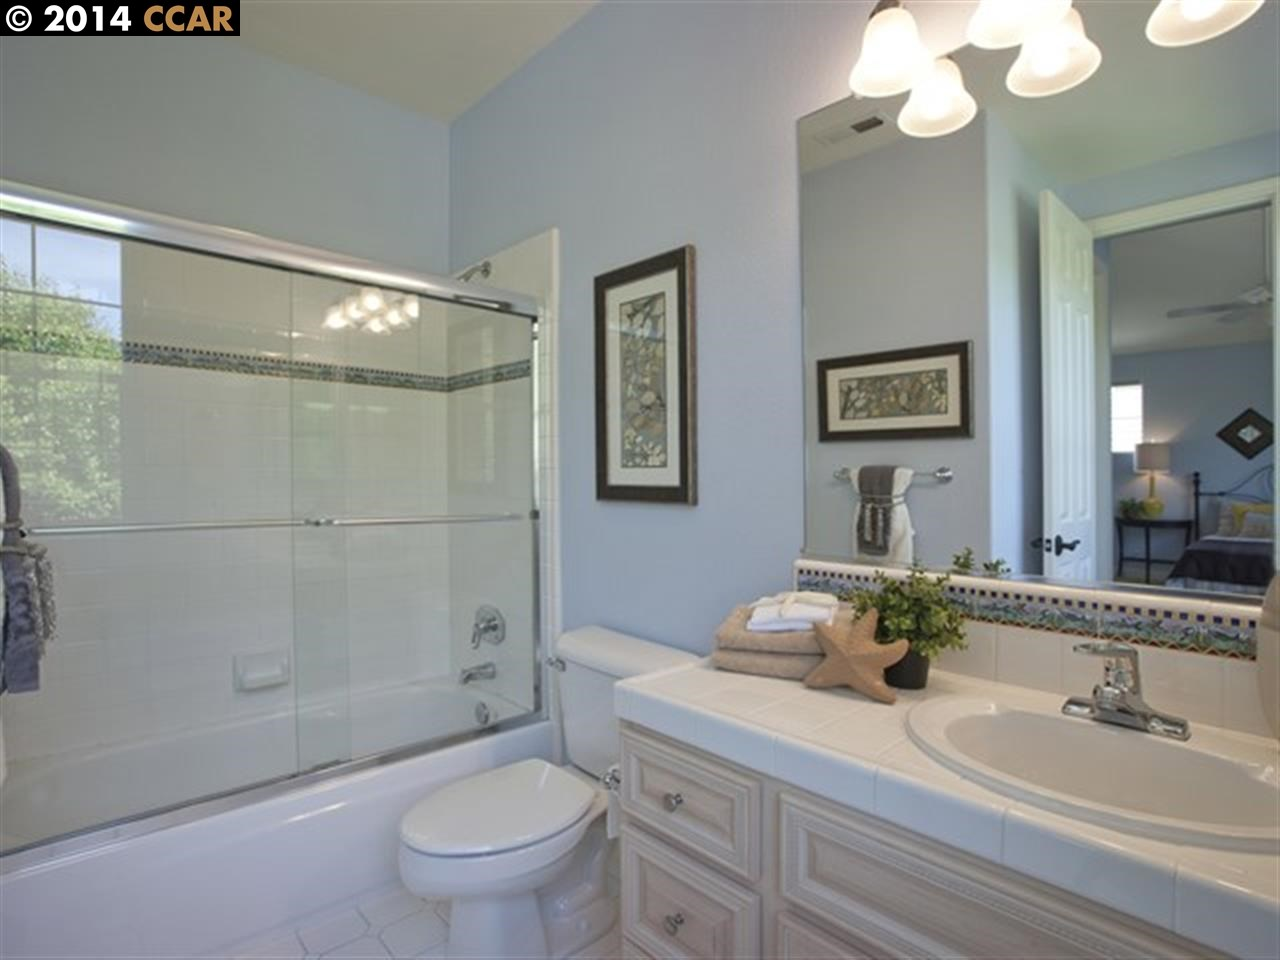 Additional photo for property listing at 1590 SERAFIX Road  Alamo, California 94507 United States